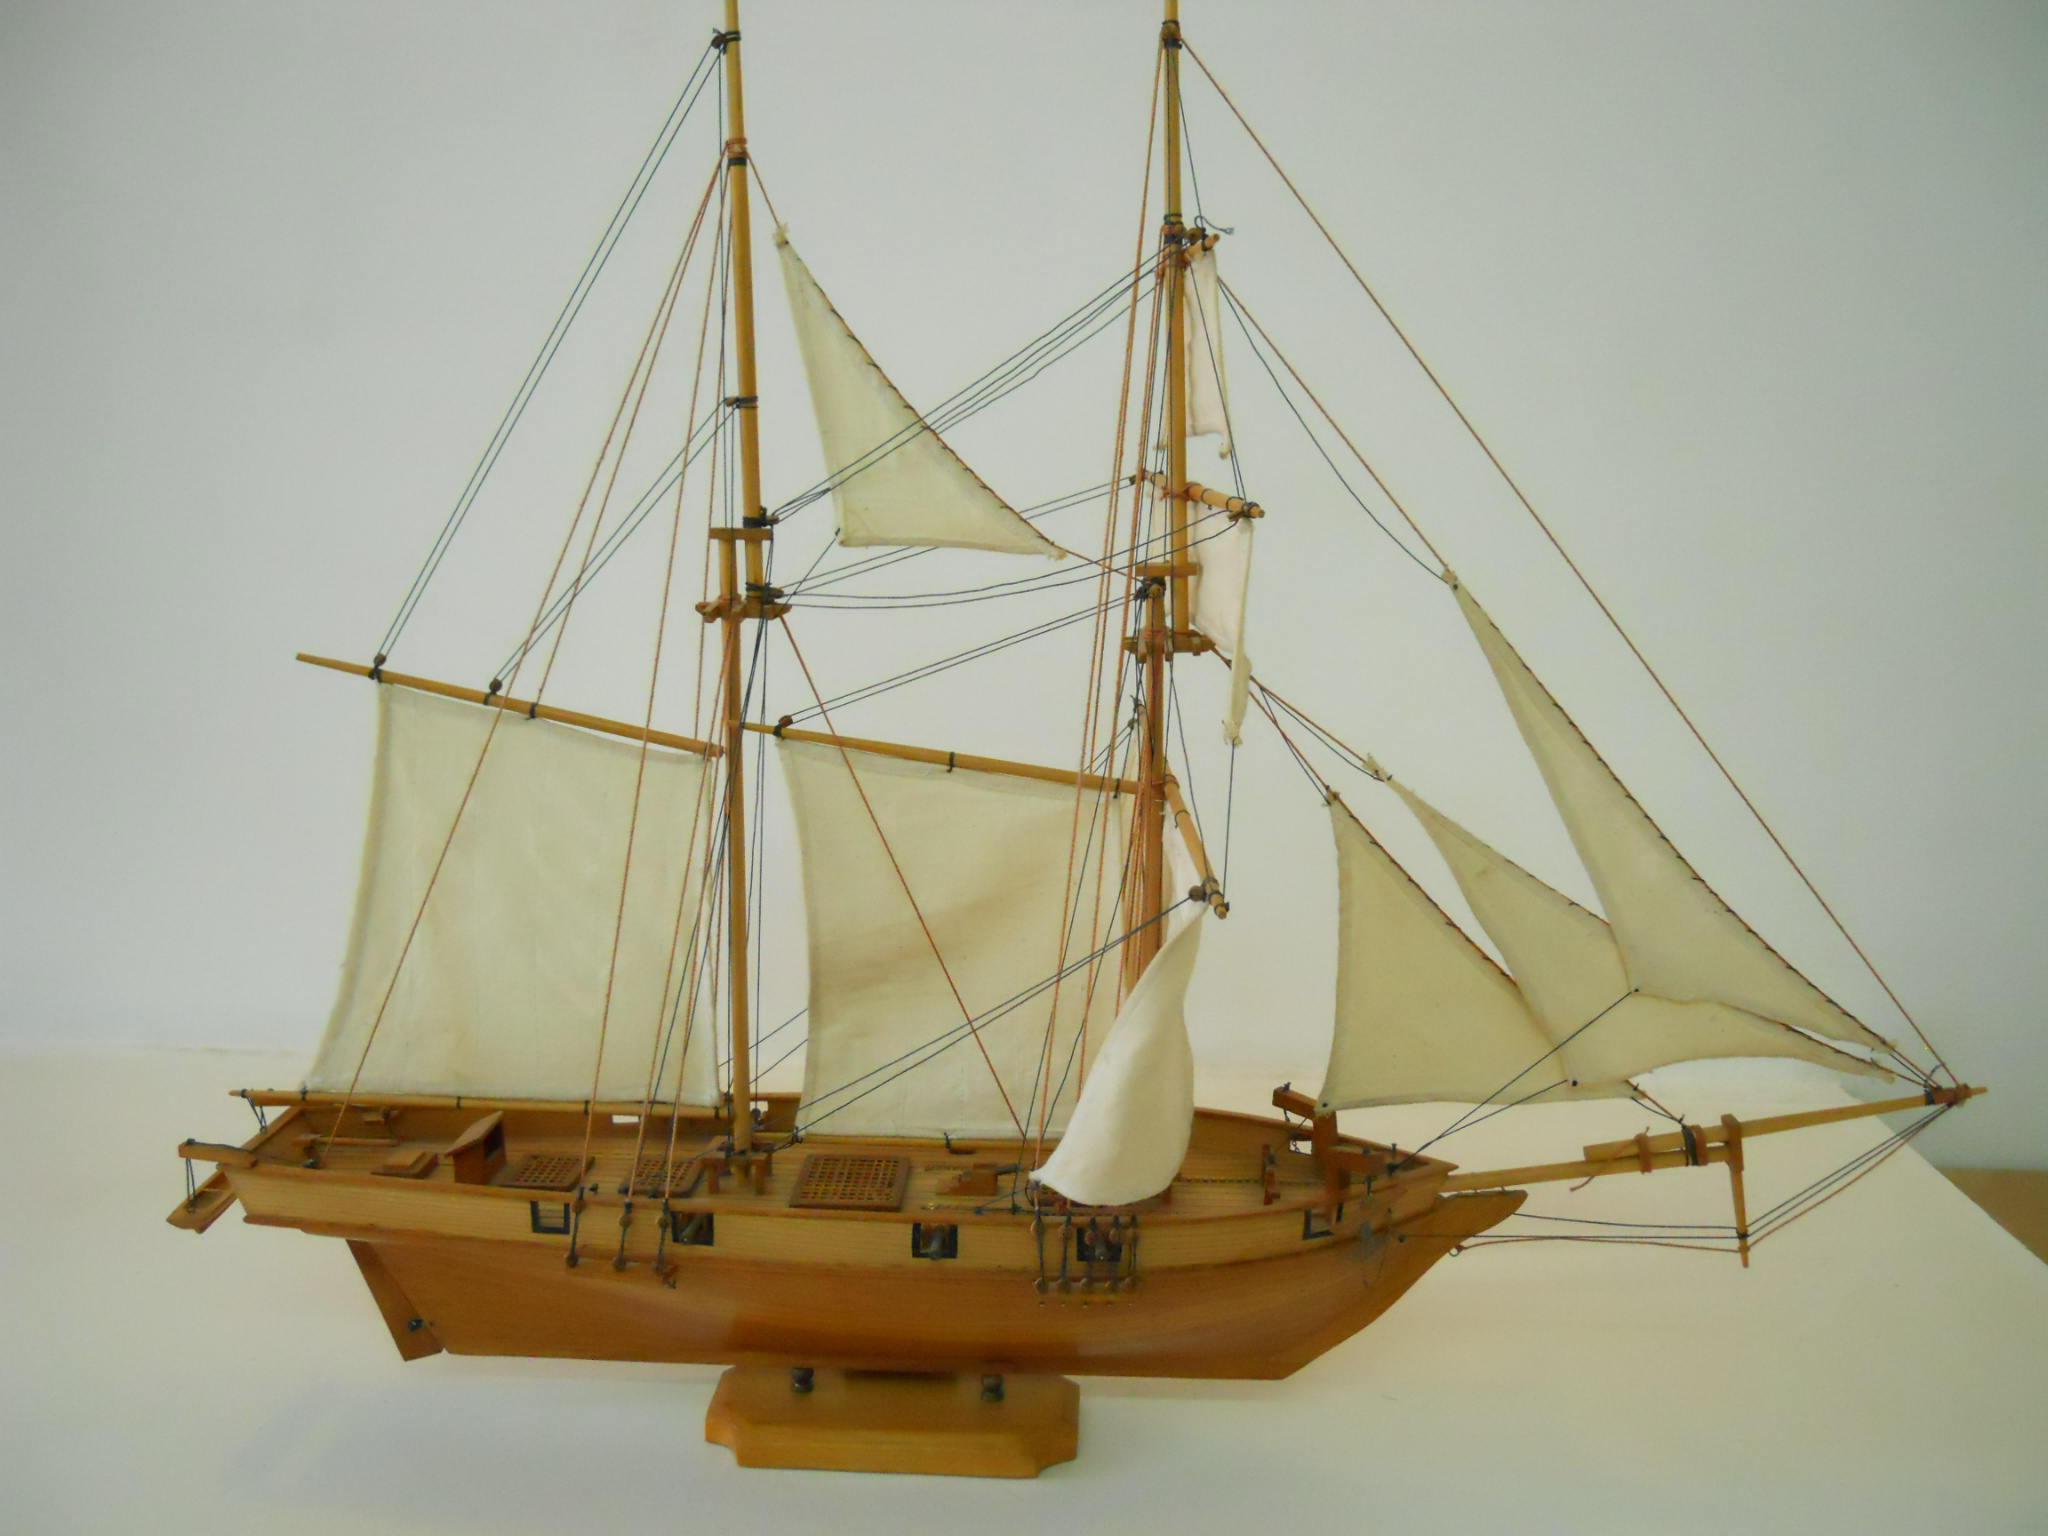 Vintage Wooden Model Shipboat Handmade By Mauritian Artisans Long 72 Cms America Schooner The Albatross 1840 Schooner Chandlery